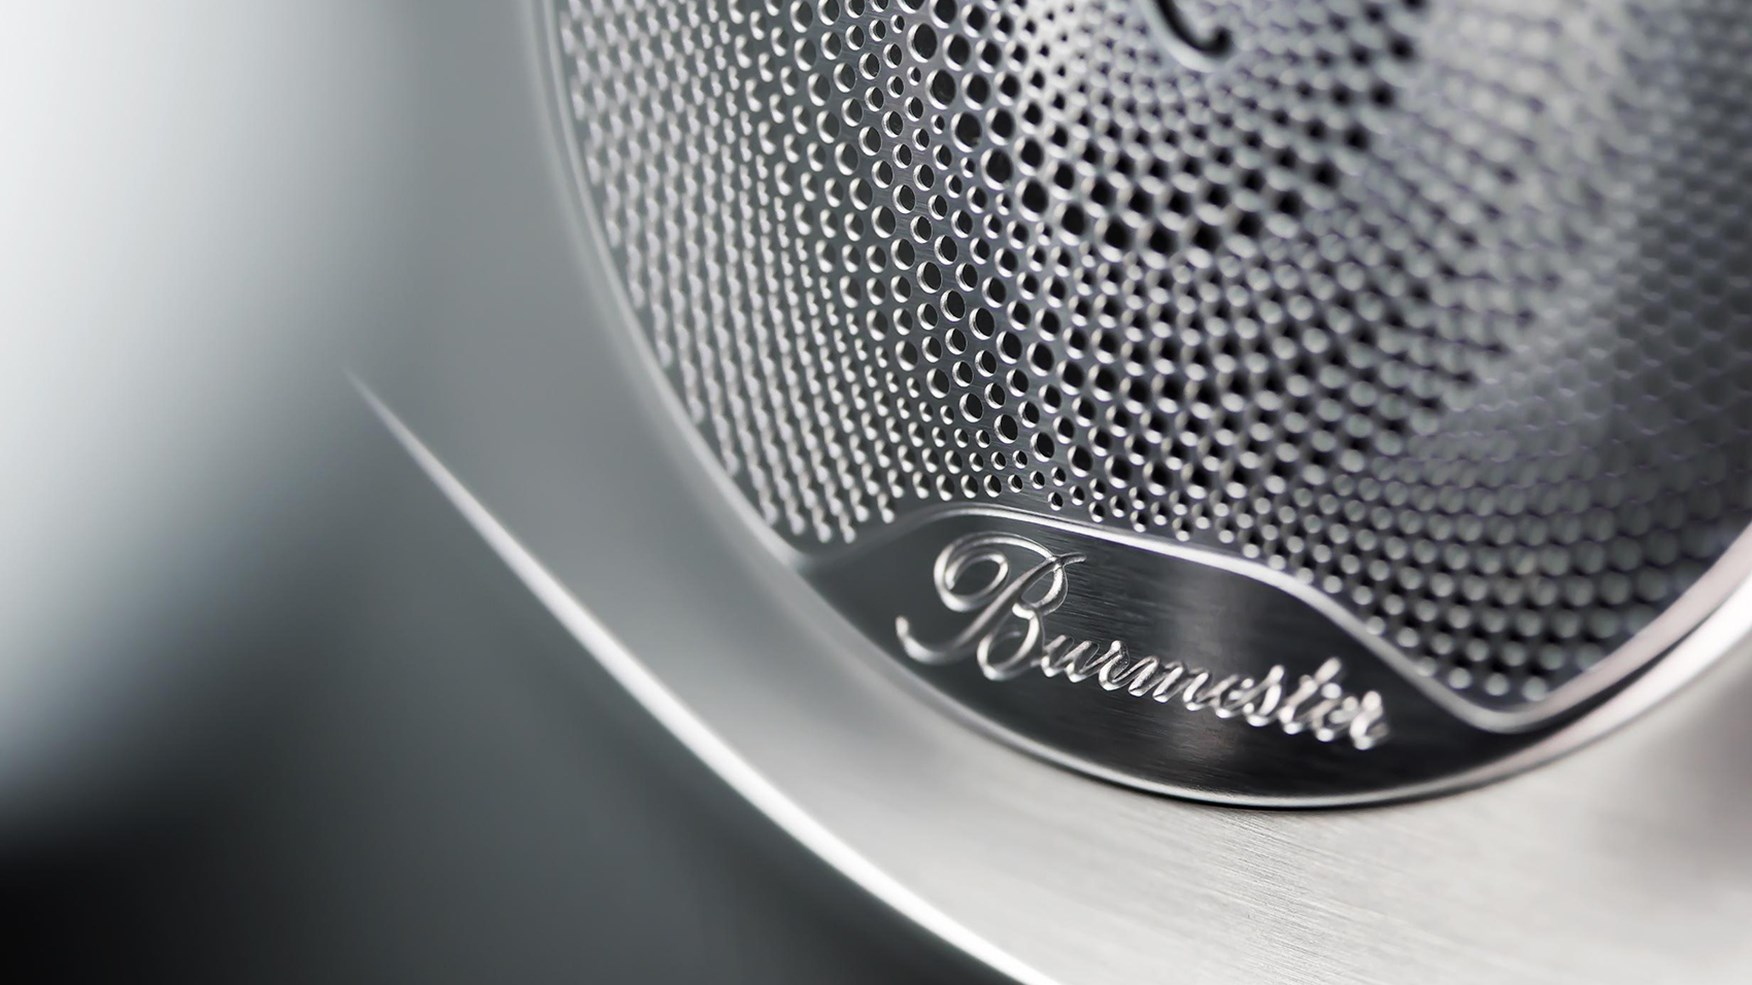 Burmester Car Speakers >> Mercedes GLC 350d 4 Matic AMG Line (2017) review | CAR Magazine